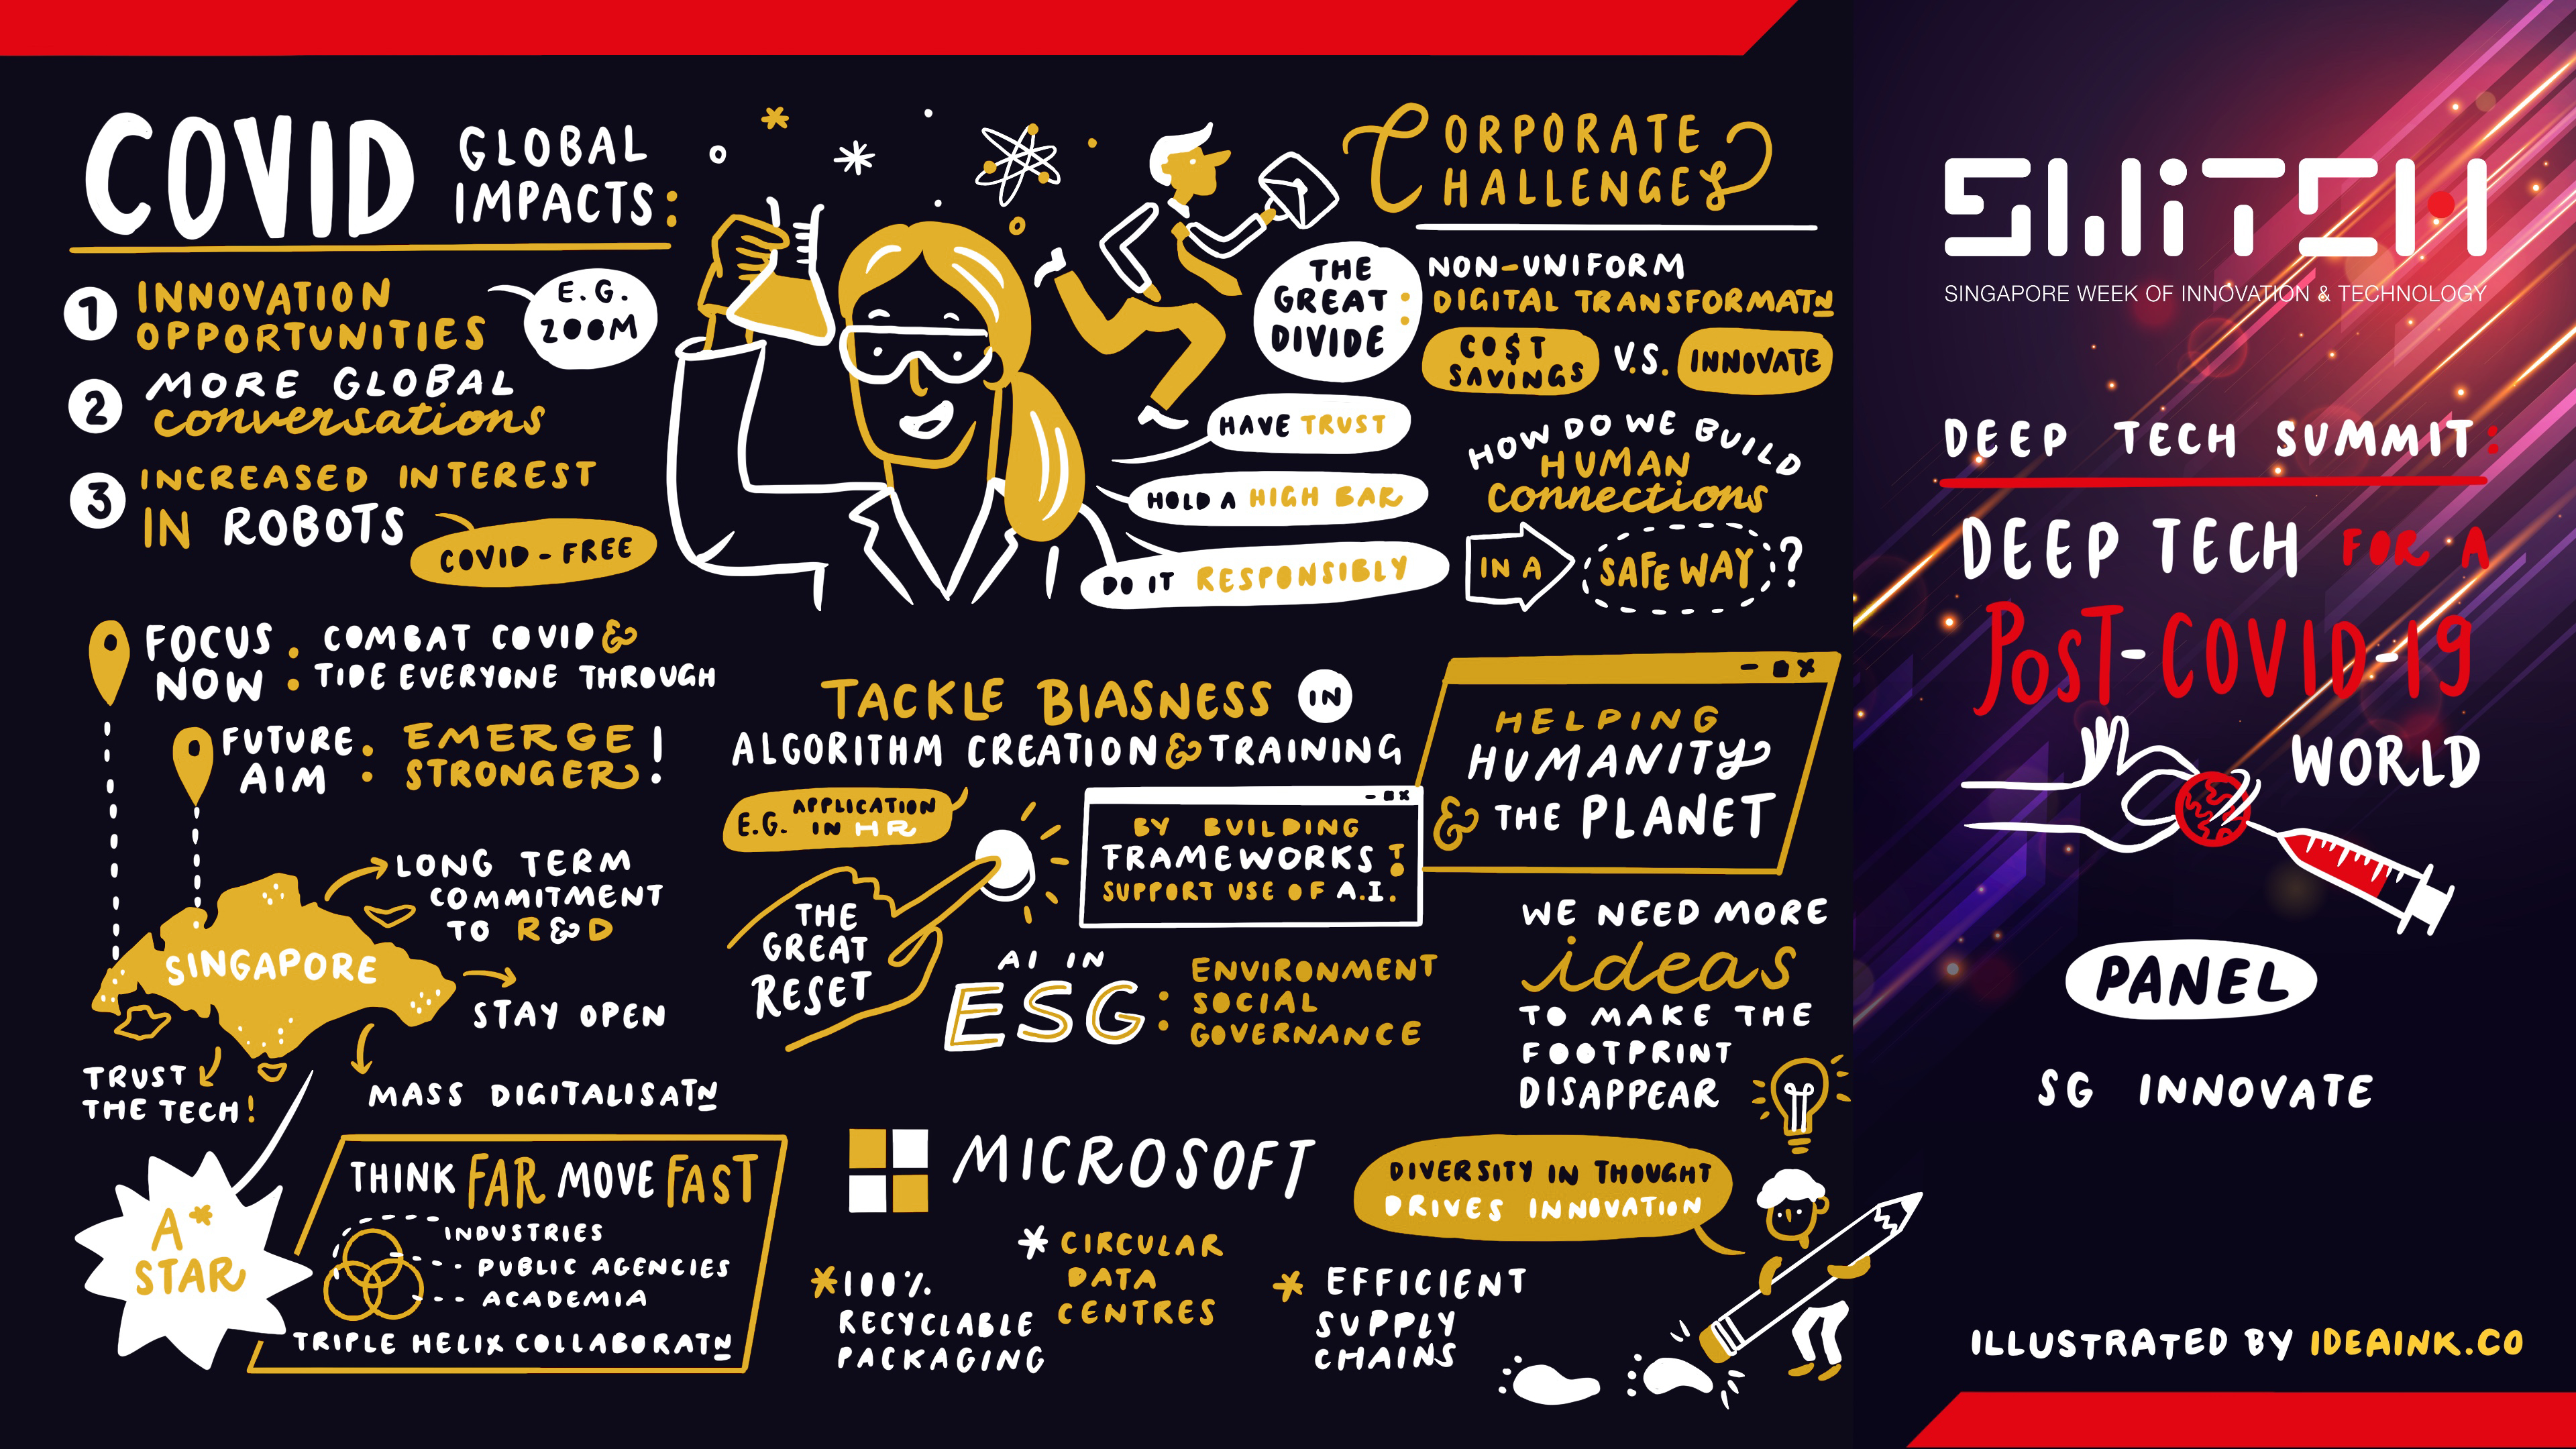 Deep Tech Summit: Deep Tech for a Post-COVID-19 World